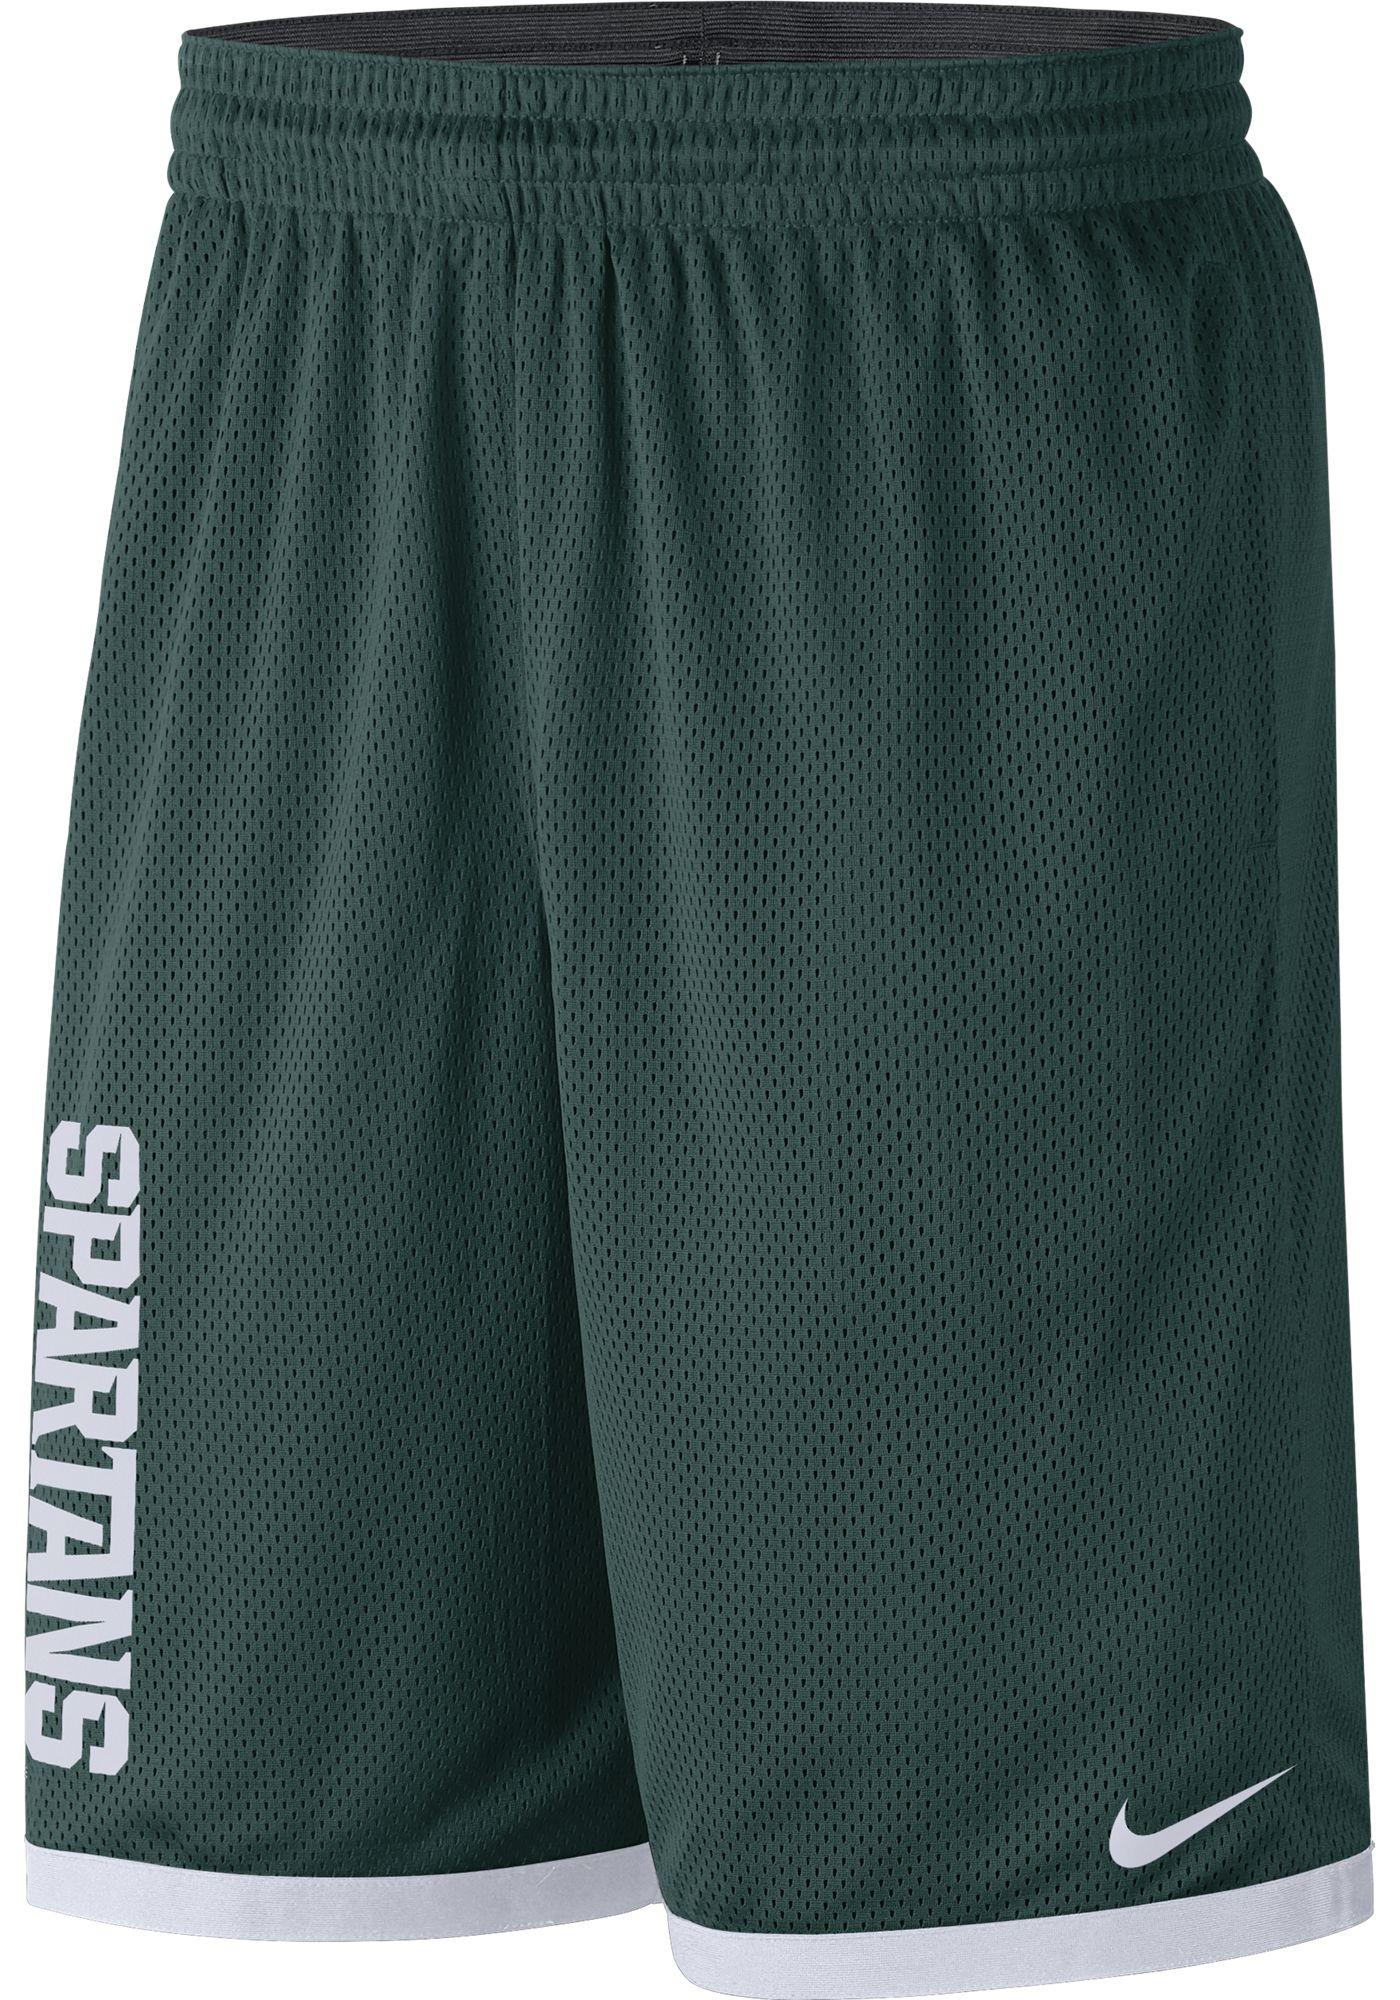 Nike Men's Michigan State Spartans Green Dri-FIT Mesh Basketball Shorts